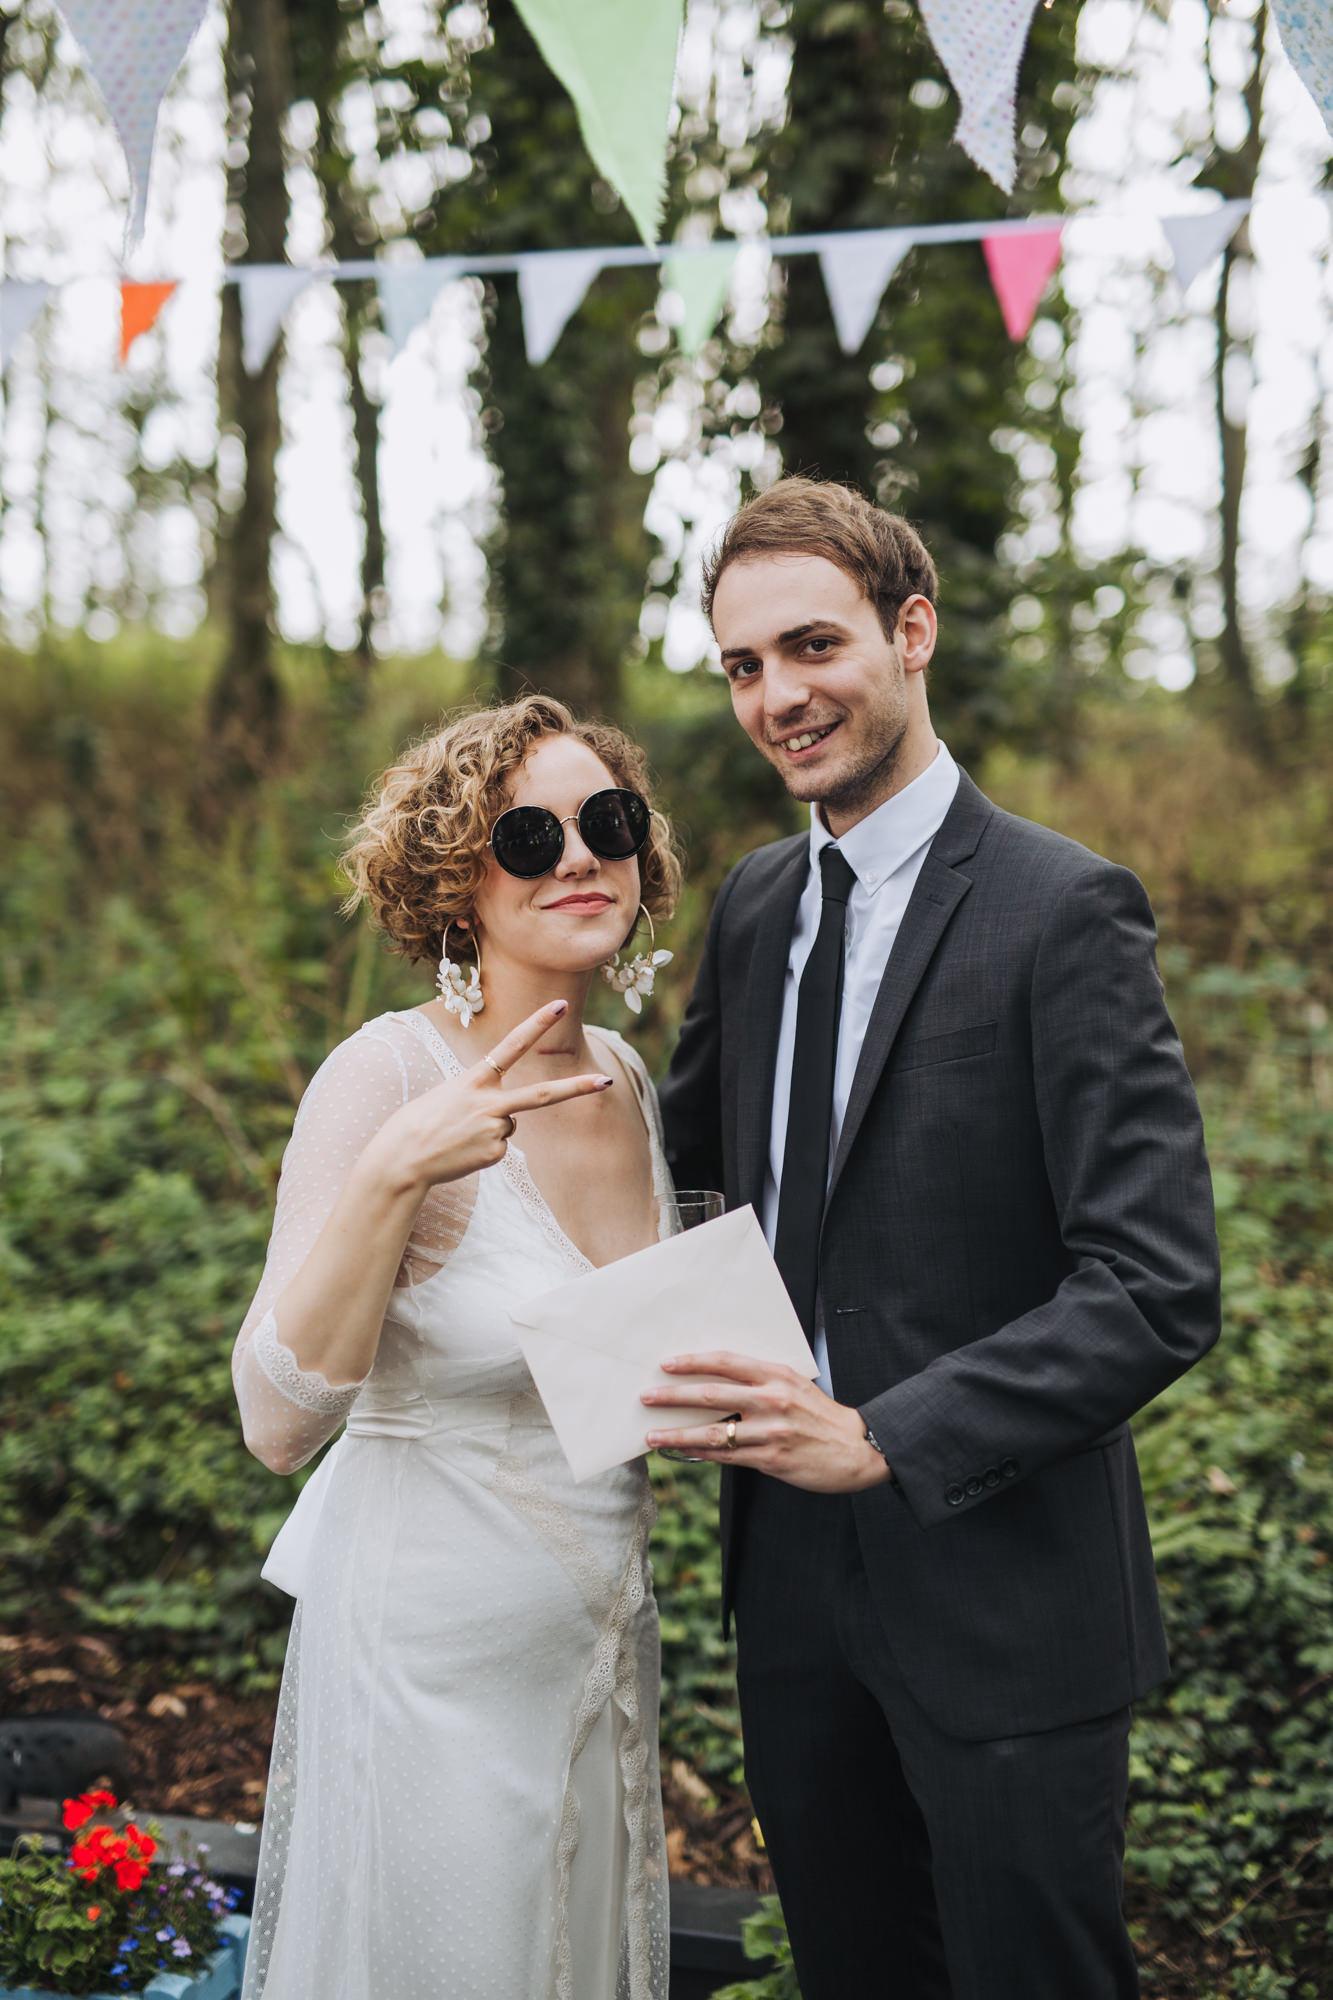 applewood wedding photographer leeds, yorkshire21.jpg